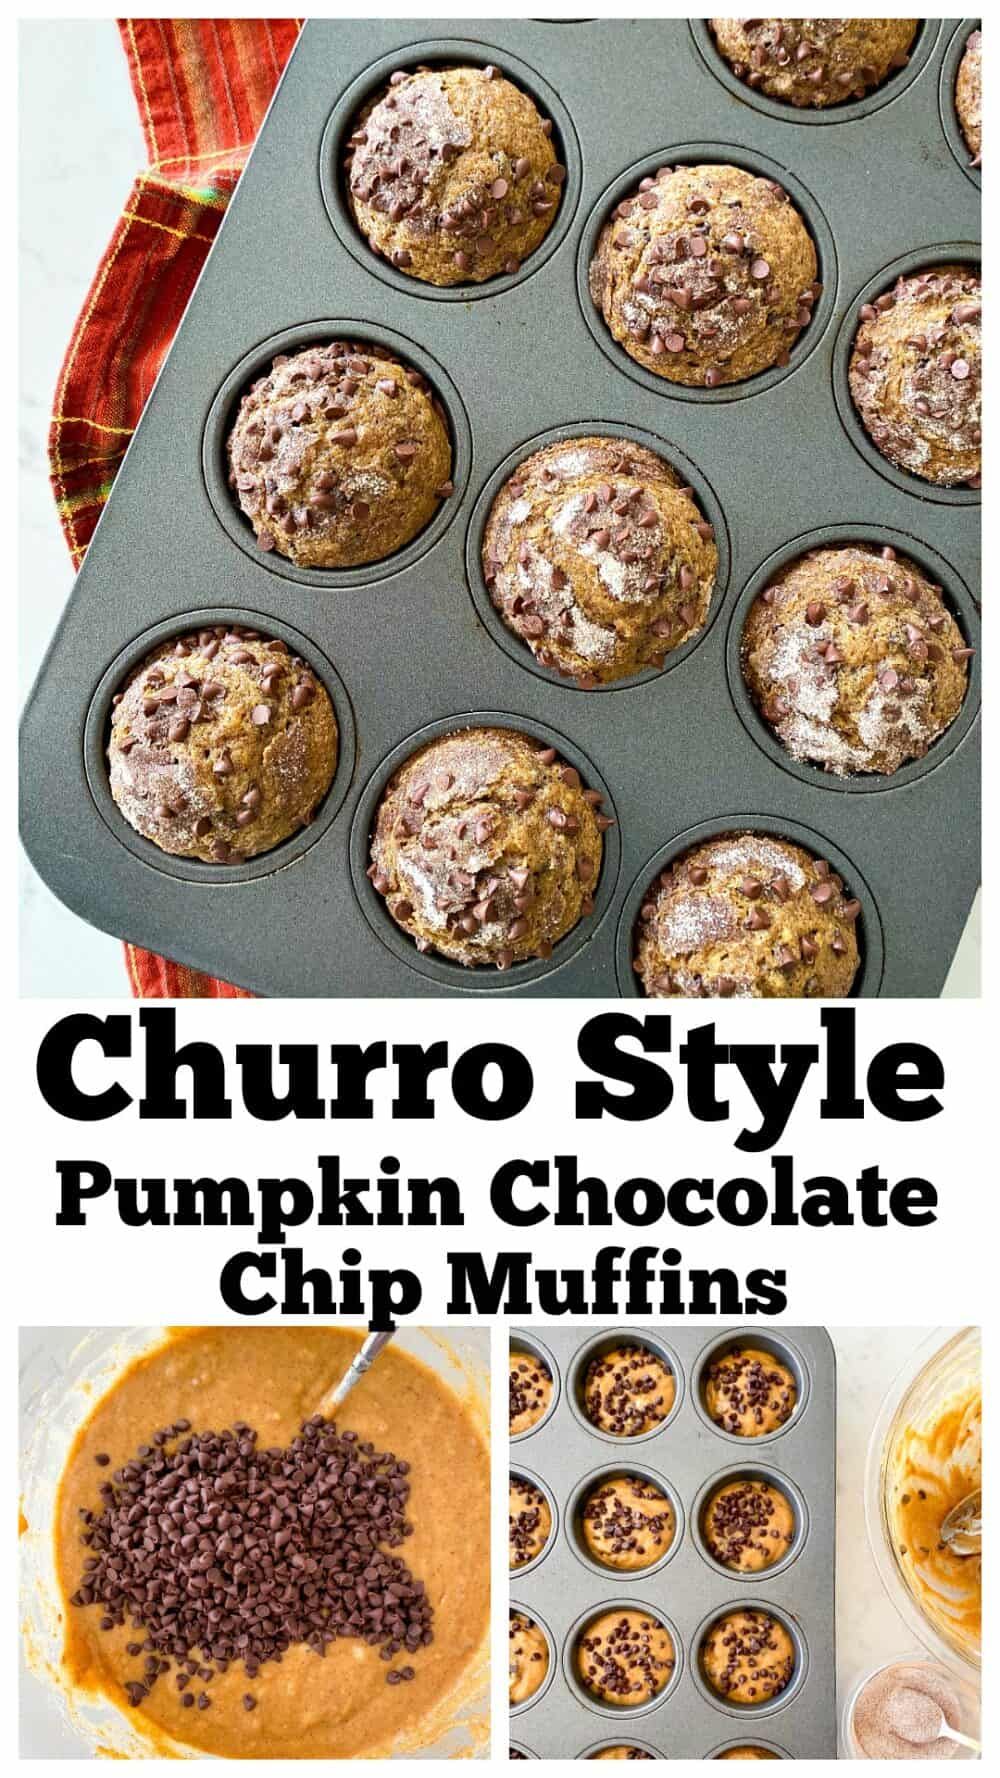 pumpkin chocolate chip muffins photo collage